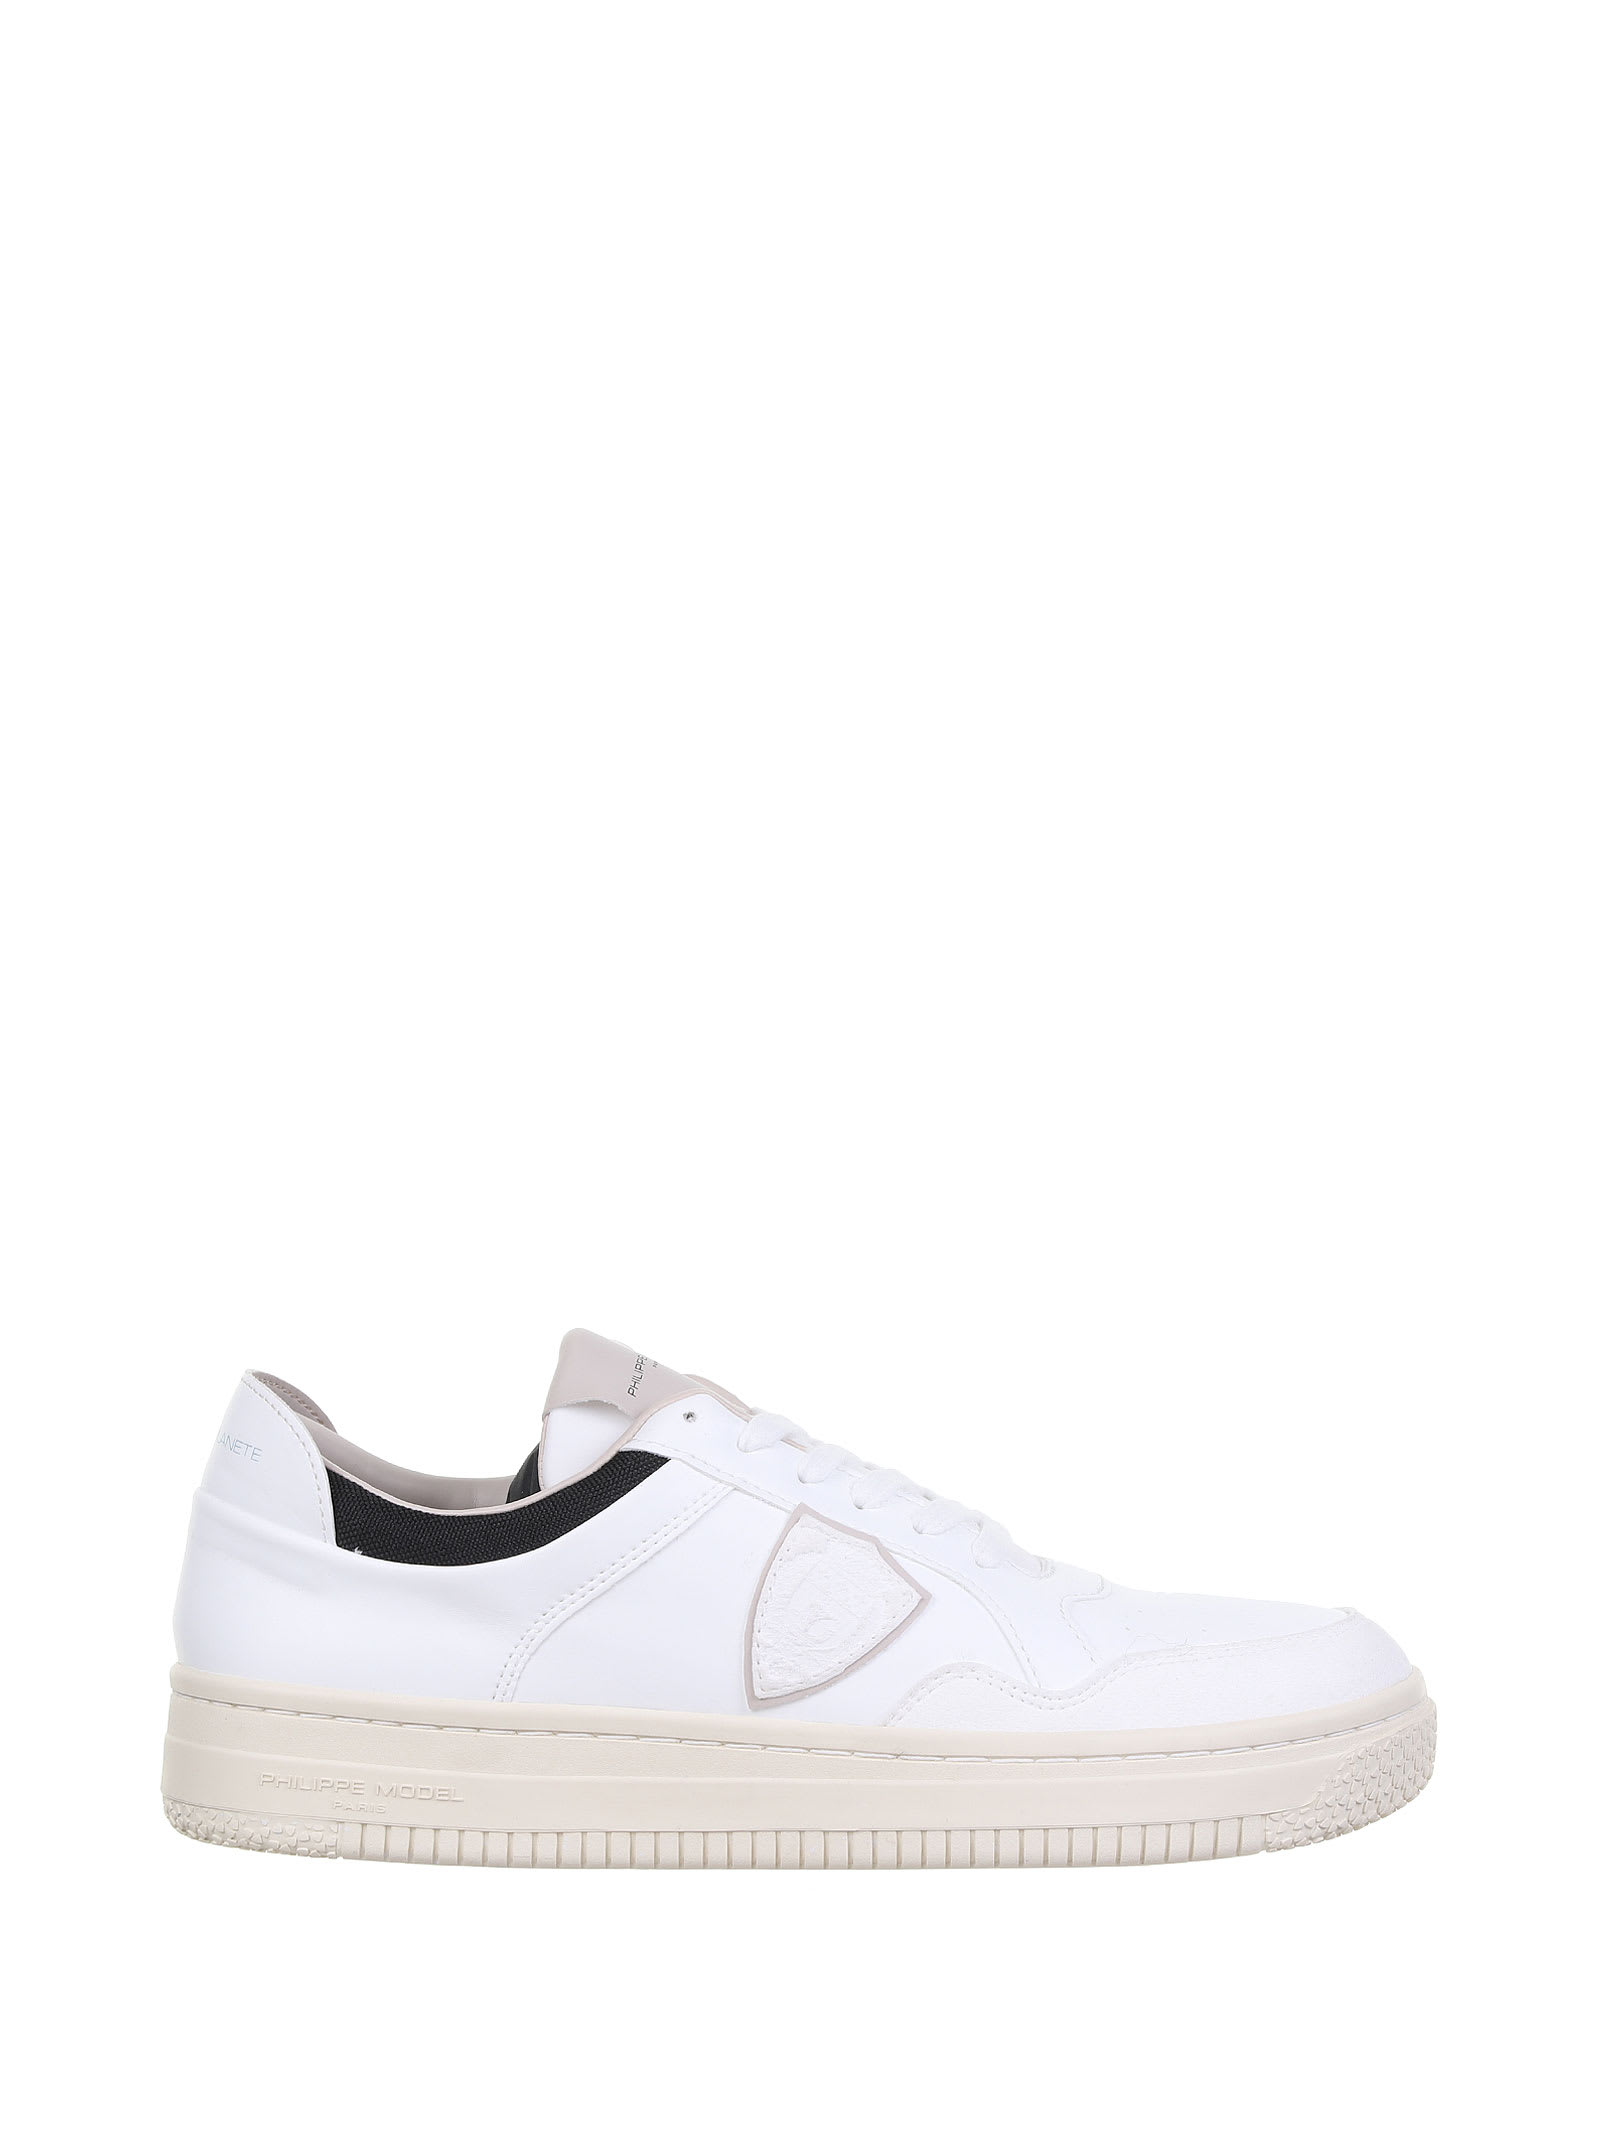 Philippe Model Sneakers LYON SNEAKERS